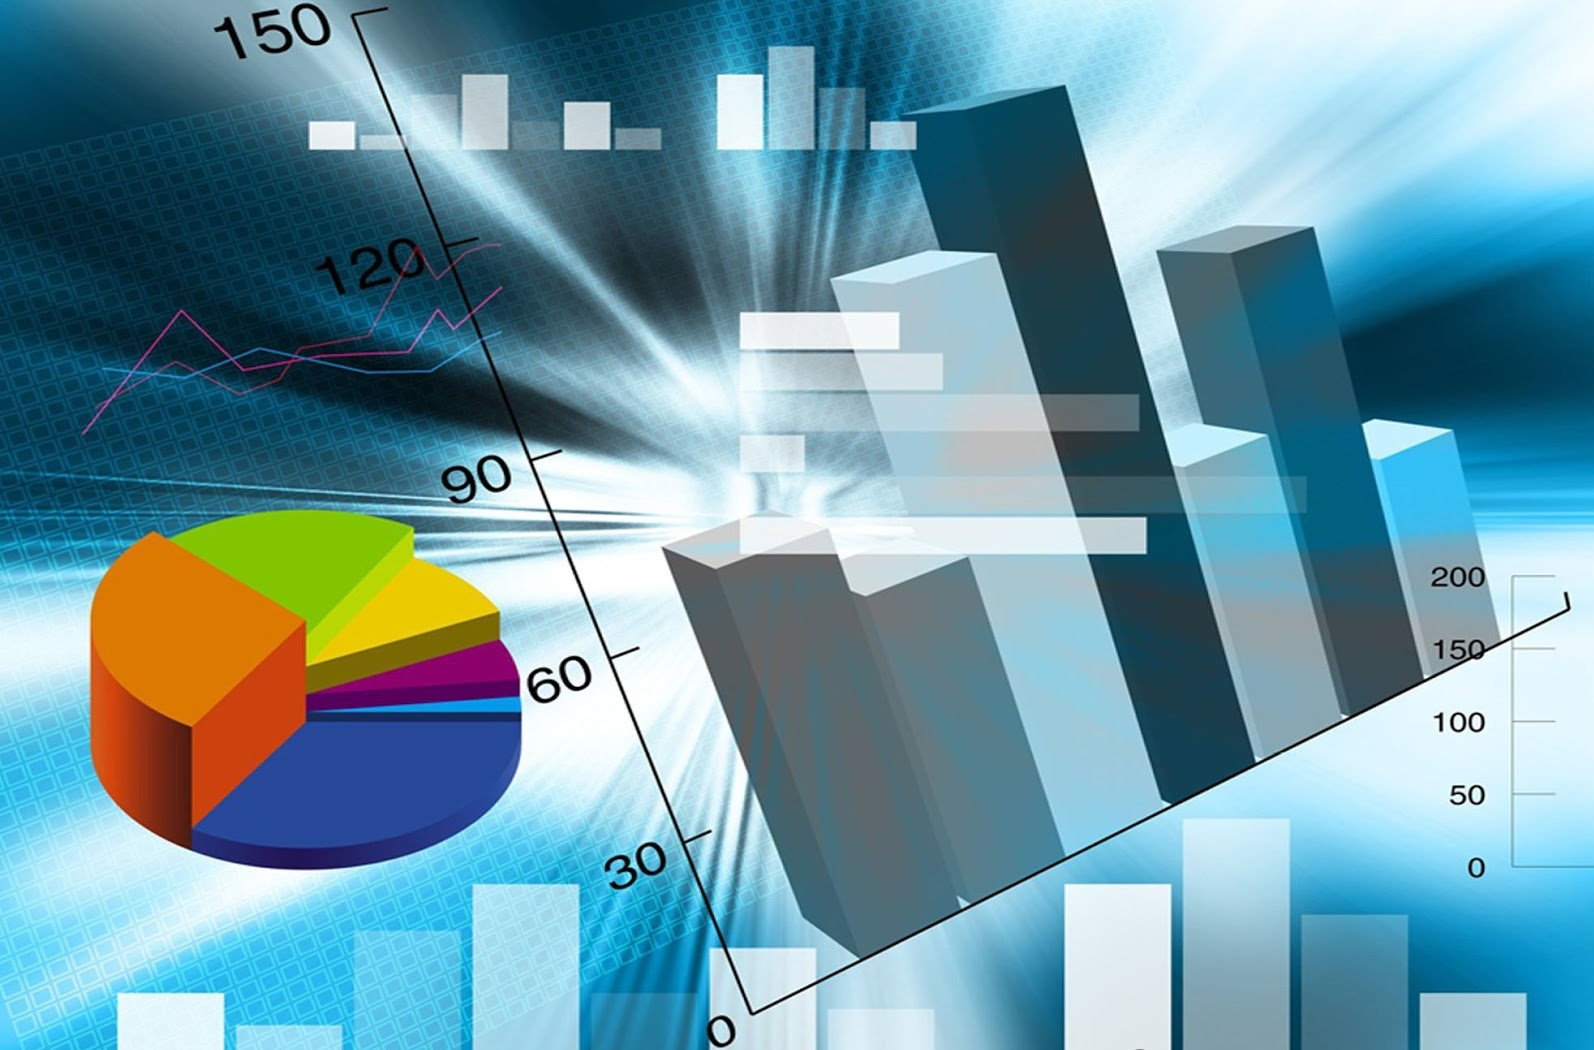 Mergers & Acquisitions Quarterly Switzerland - Second Quarter 2013